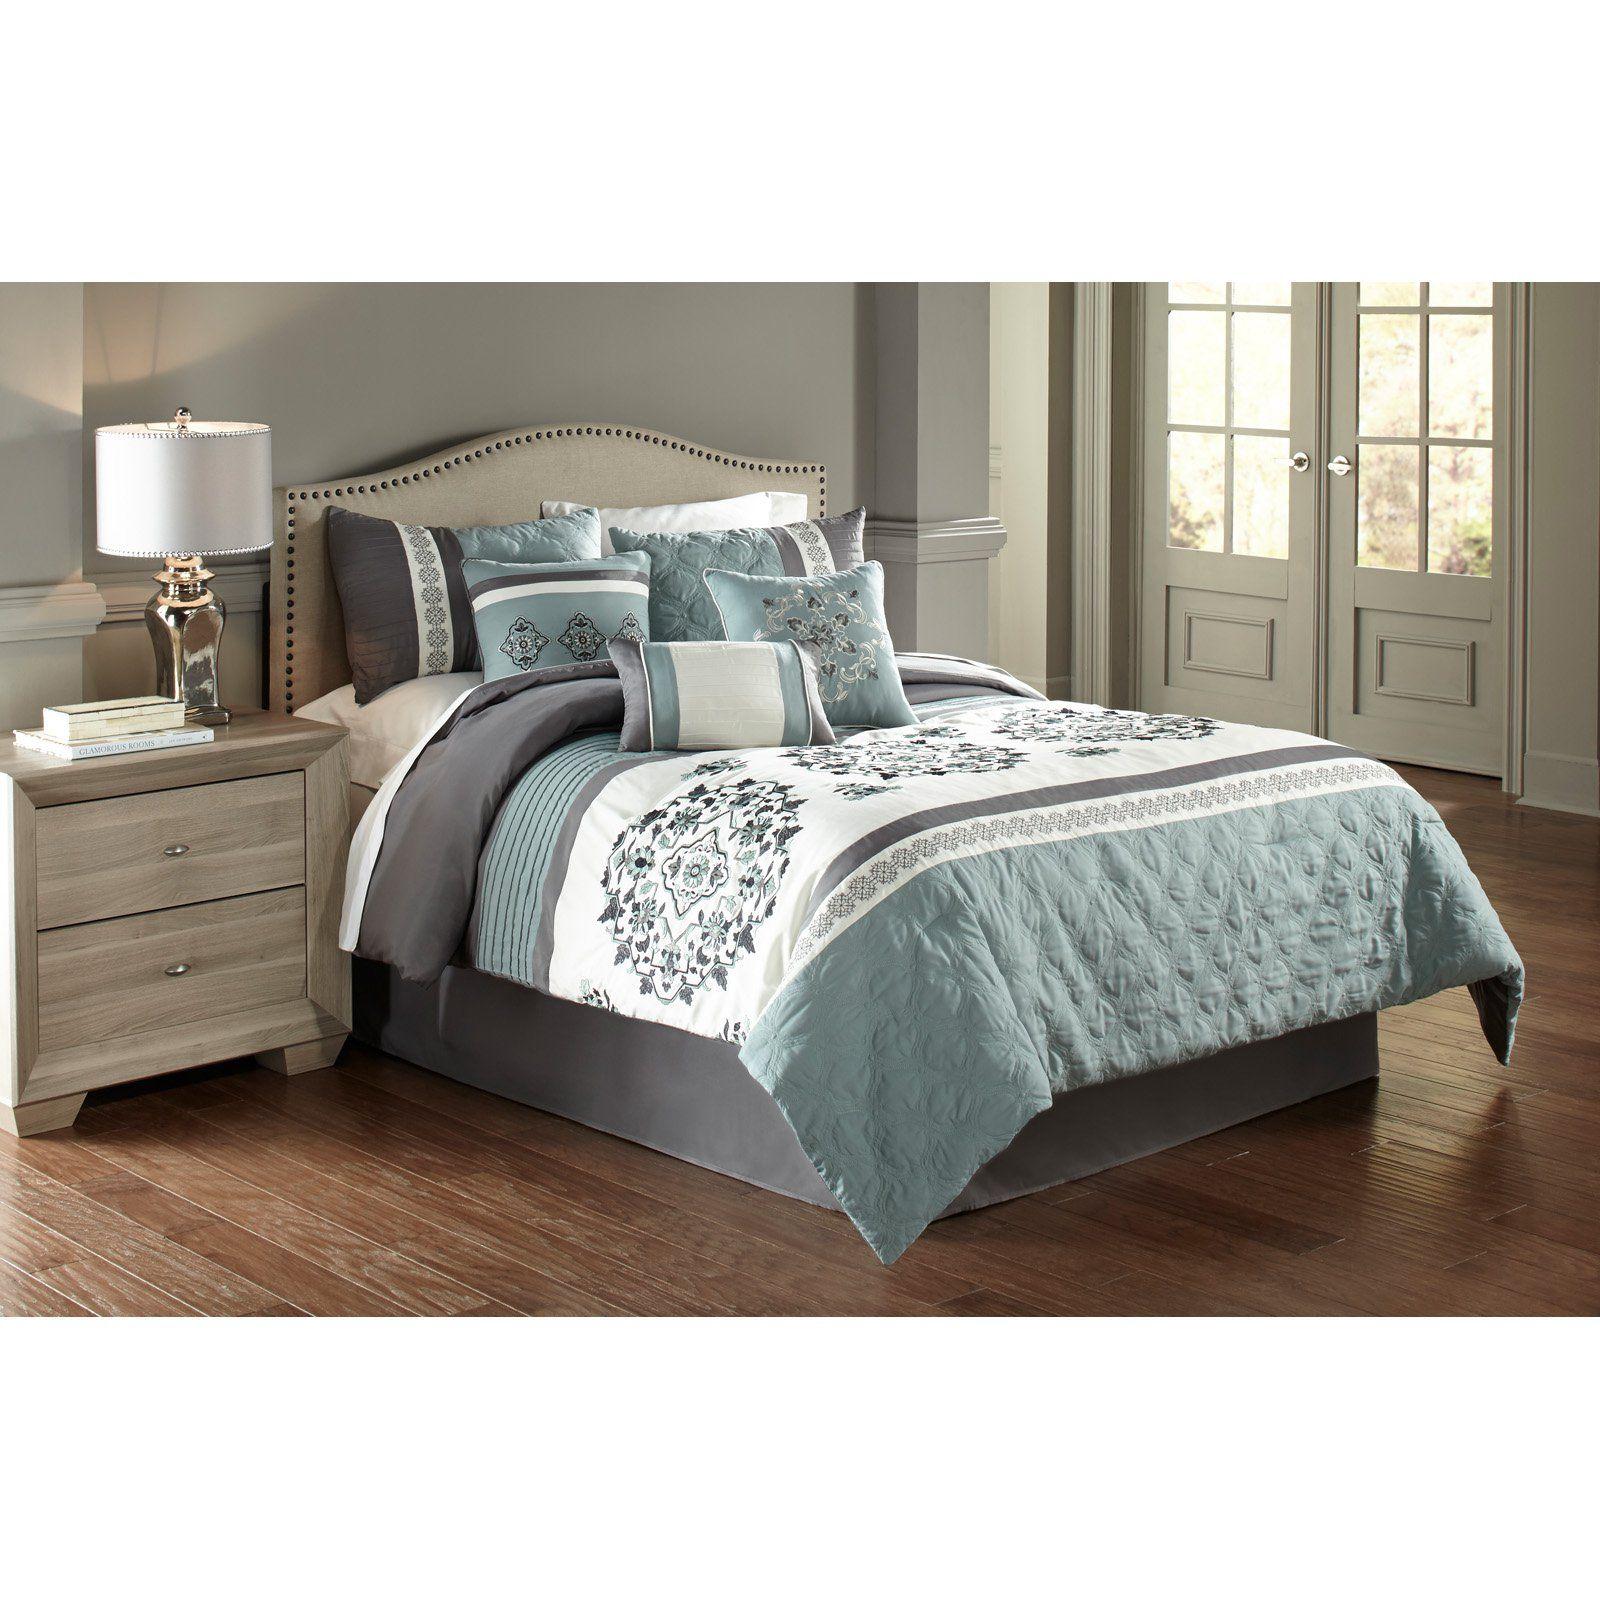 Aria 7 Piece Comforter Set By Hallmart Blue Comforter Sets Grey